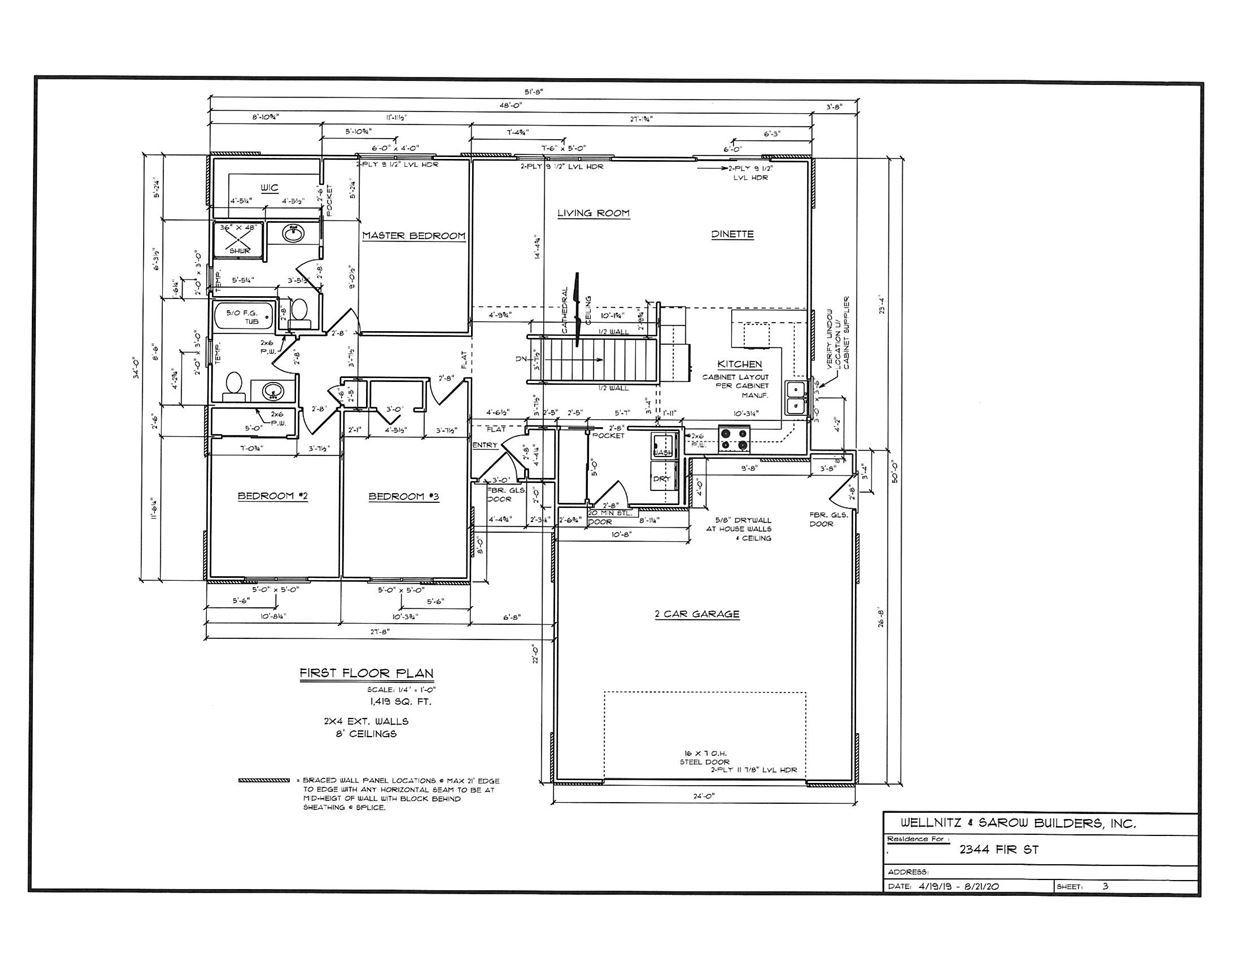 f_1901686_02 Real Estate in 53546 zip code